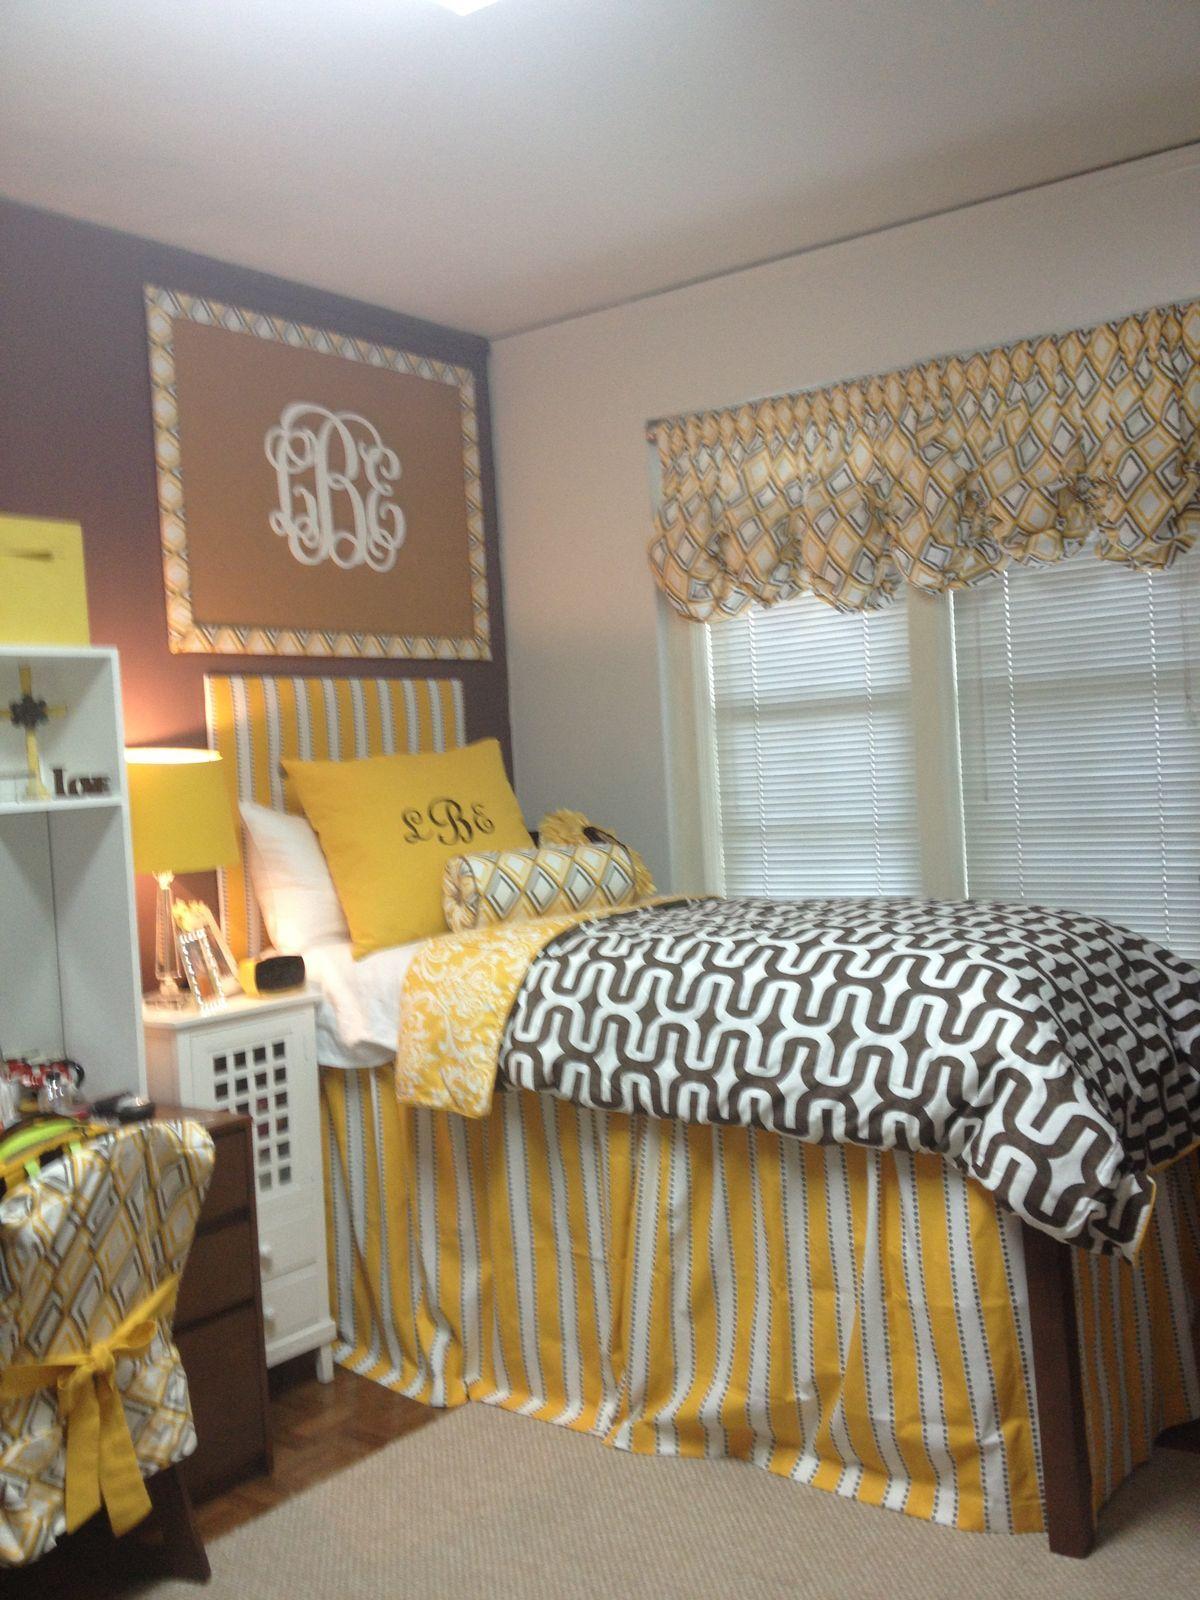 Dorm Room Plans: Ce479415fb6af3ea408d62185ce321de.jpg 1,200×1,600 Pixels